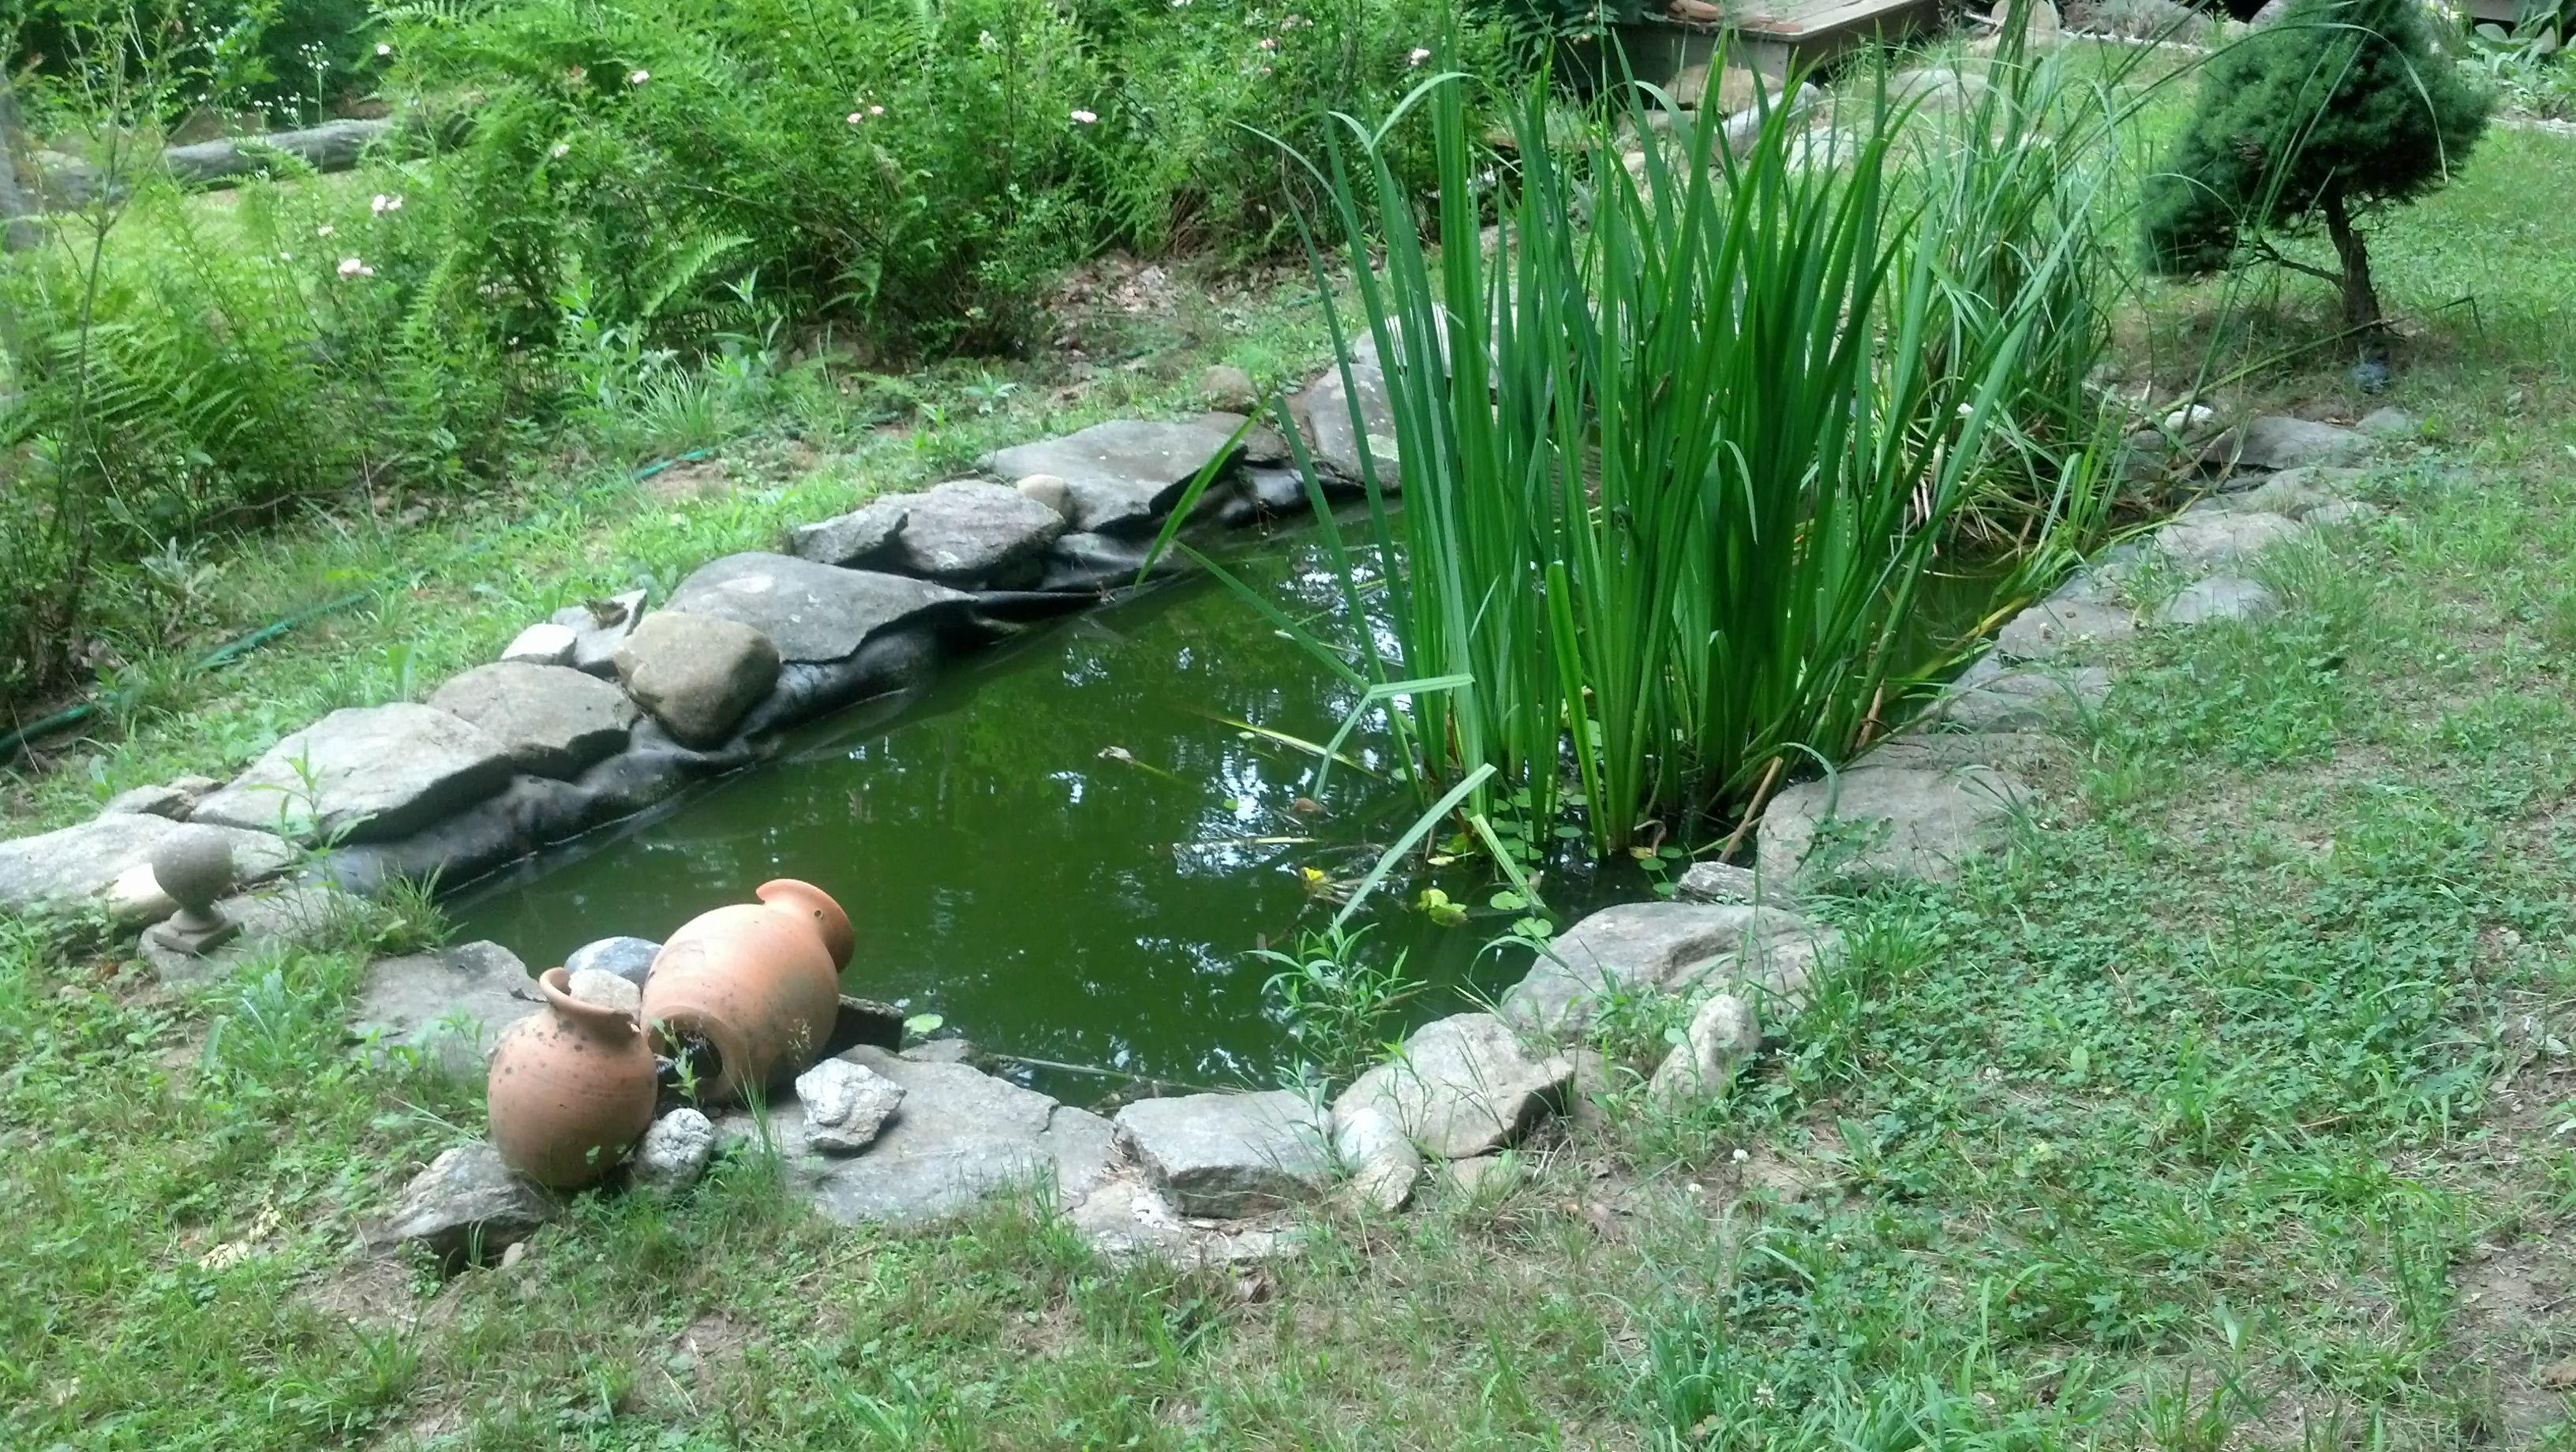 Backyard Frog Pond frog pond | garden | pinterest | pond, backyard and garden